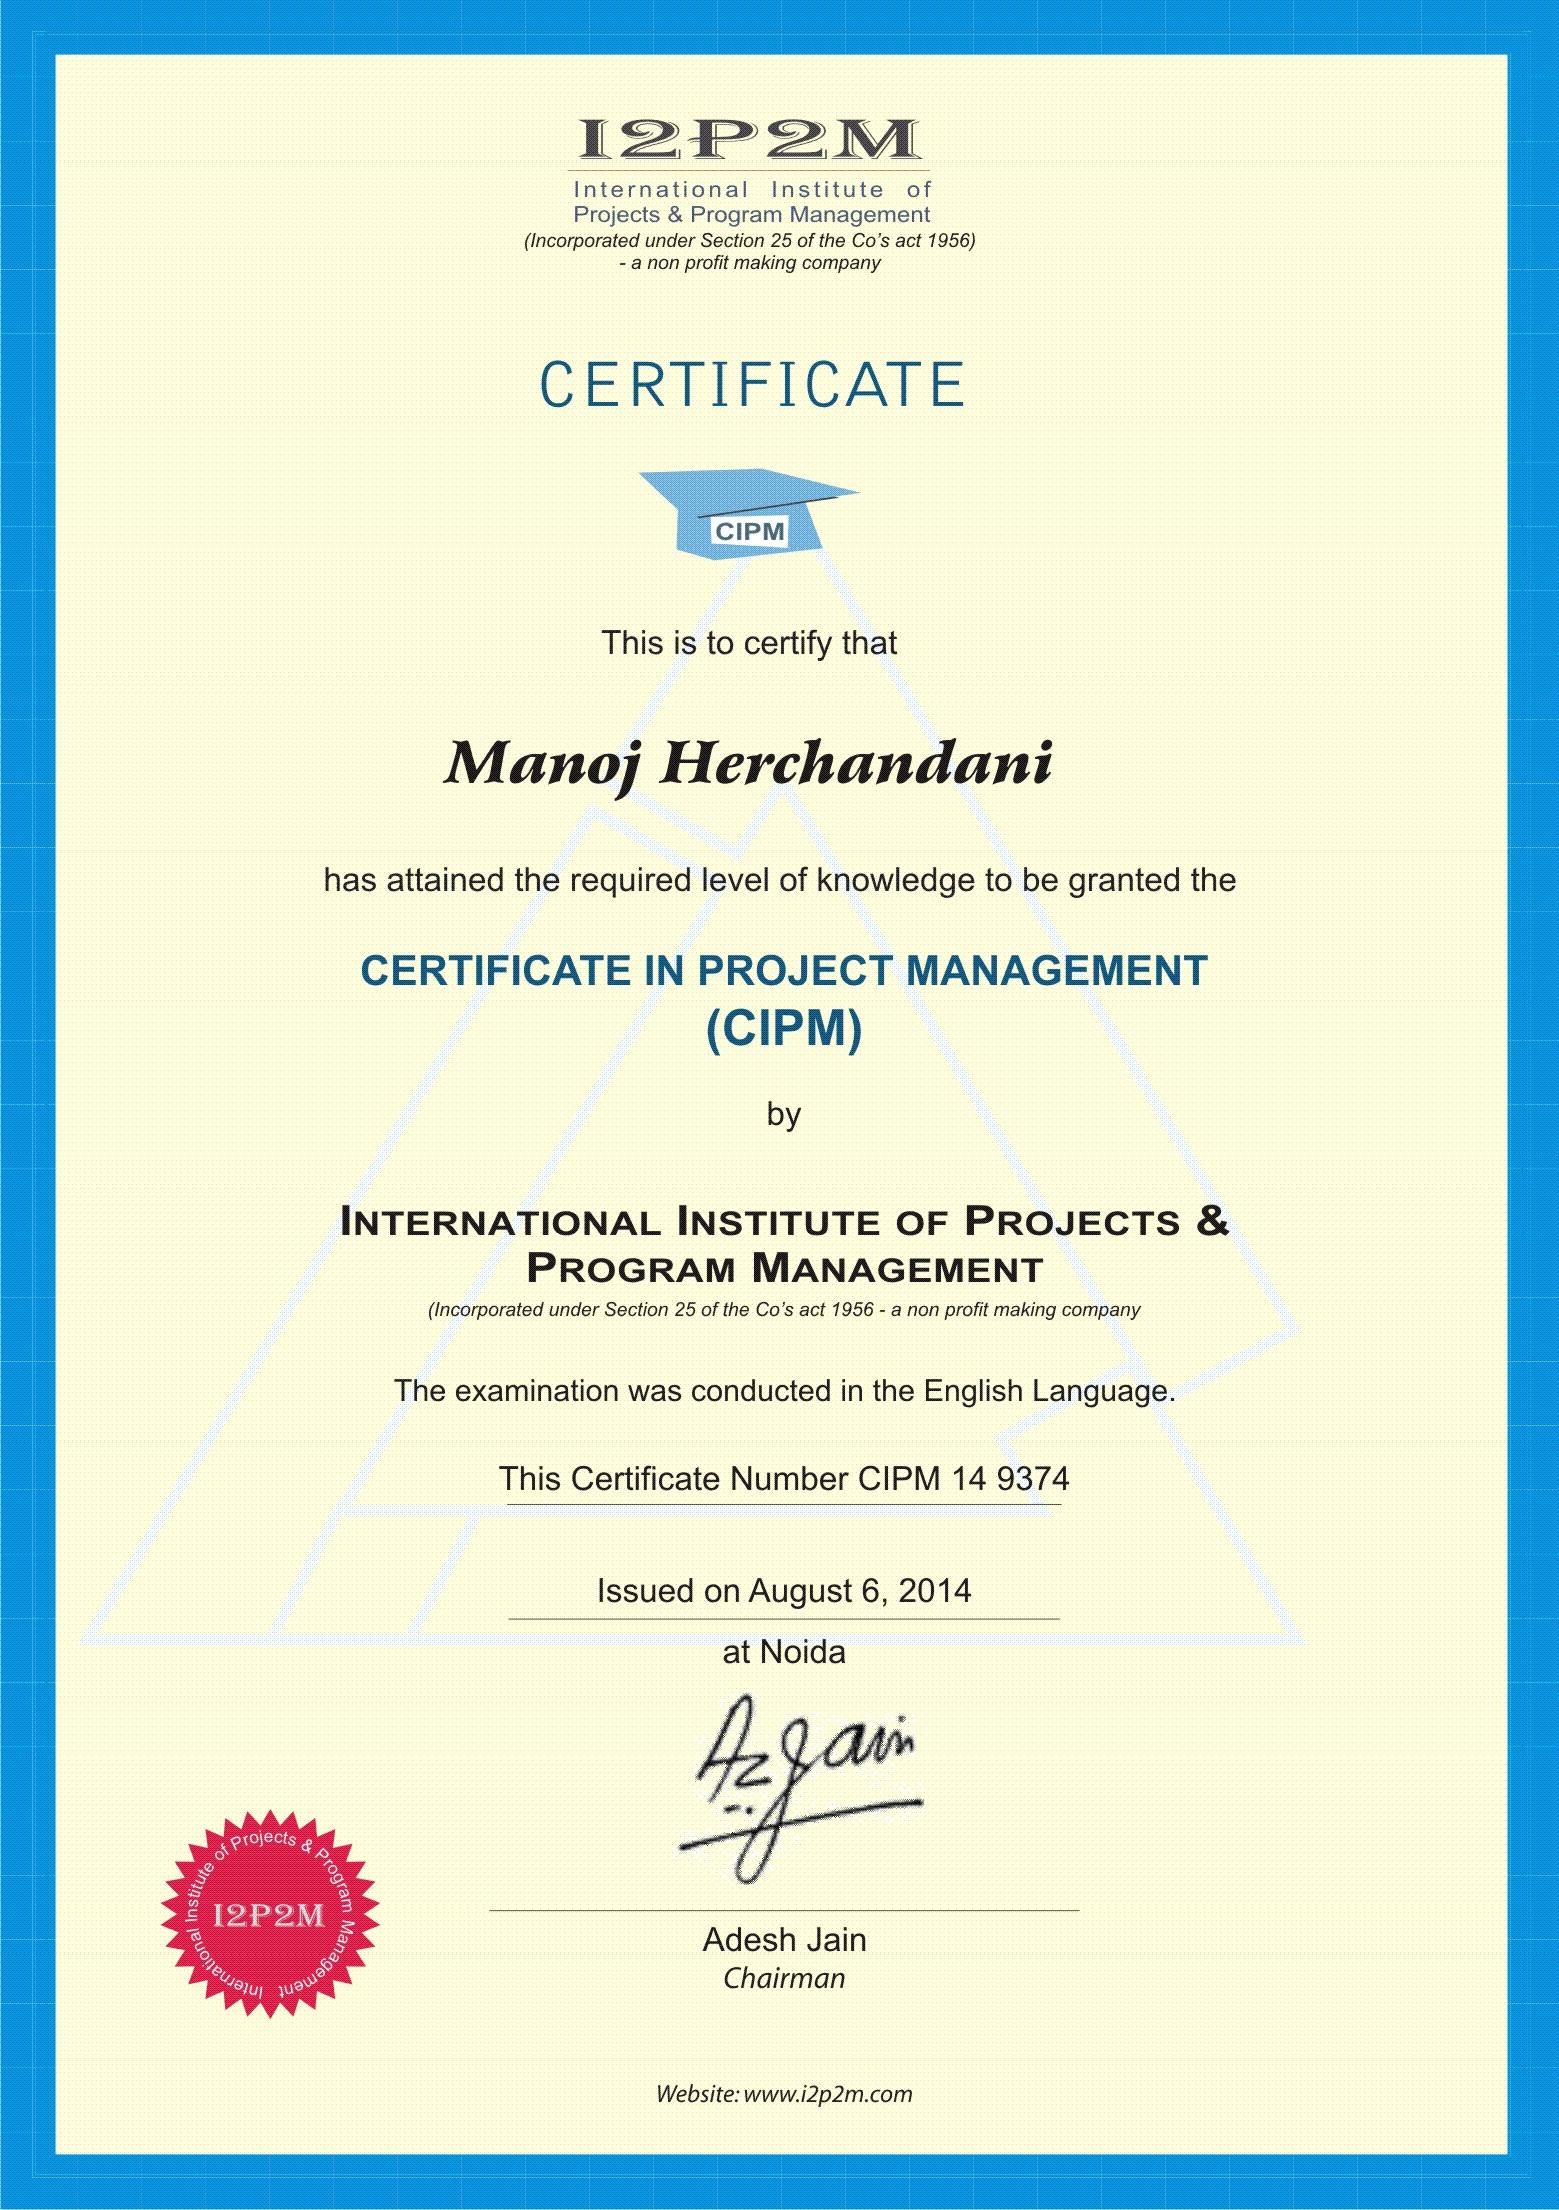 Manoj harchandani bayt at international institute of project program management 1betcityfo Images